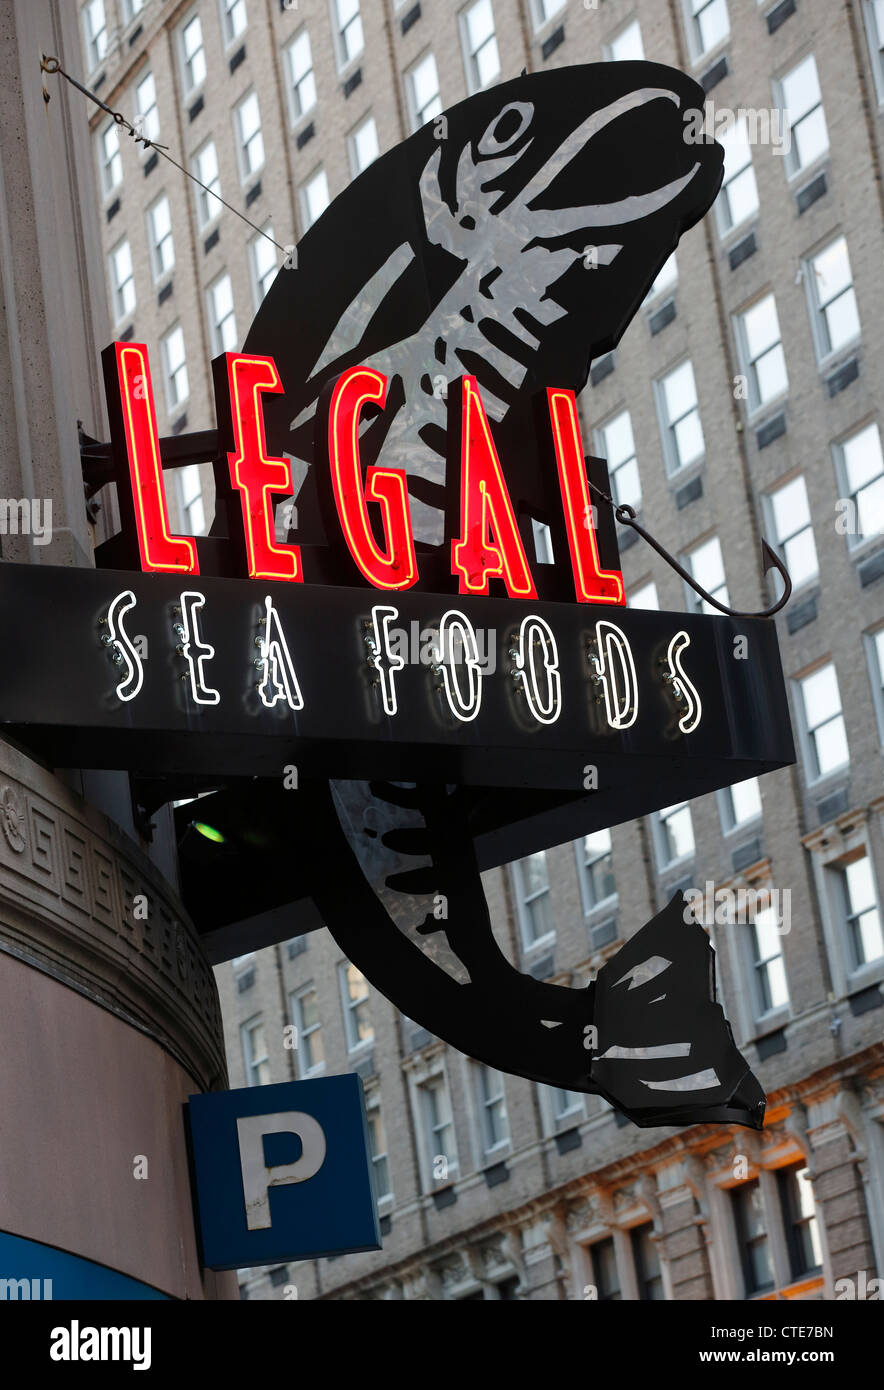 Legal Seafoods restaurant neon sign, Boston, Massachusetts - Stock Image